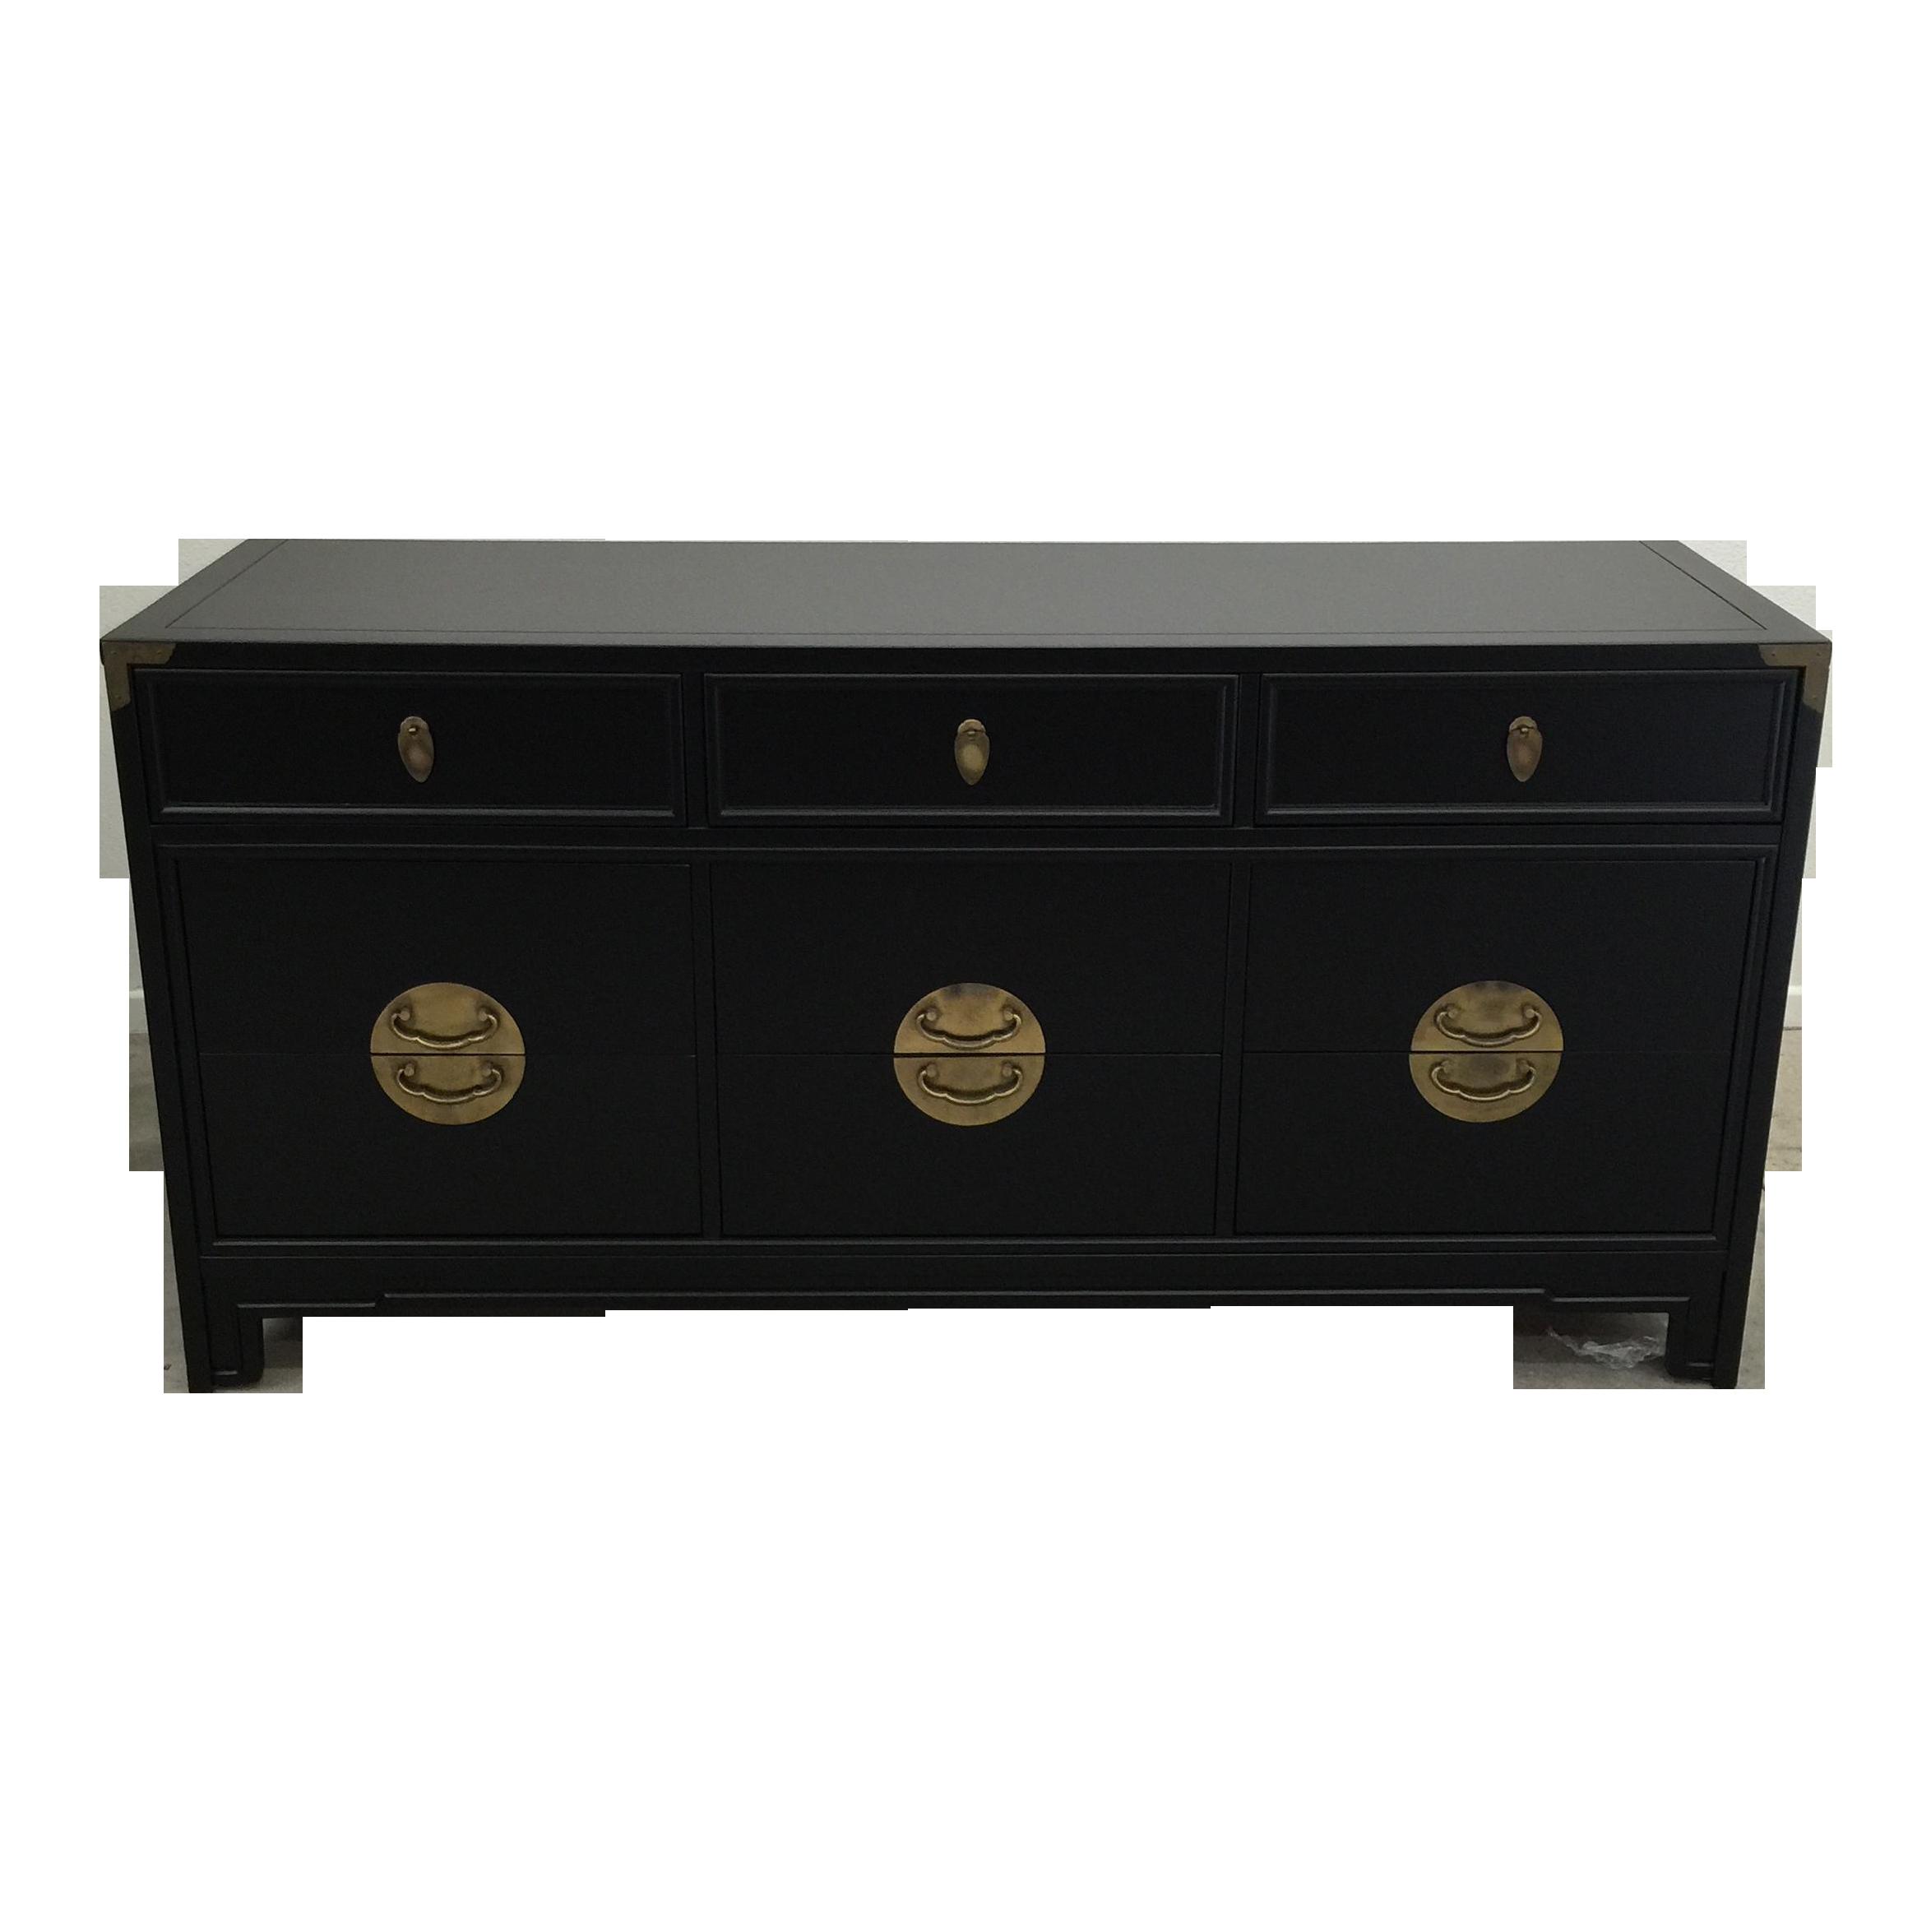 Kent coffey dresser or sideboard chairish for Sideboard 90 x 60